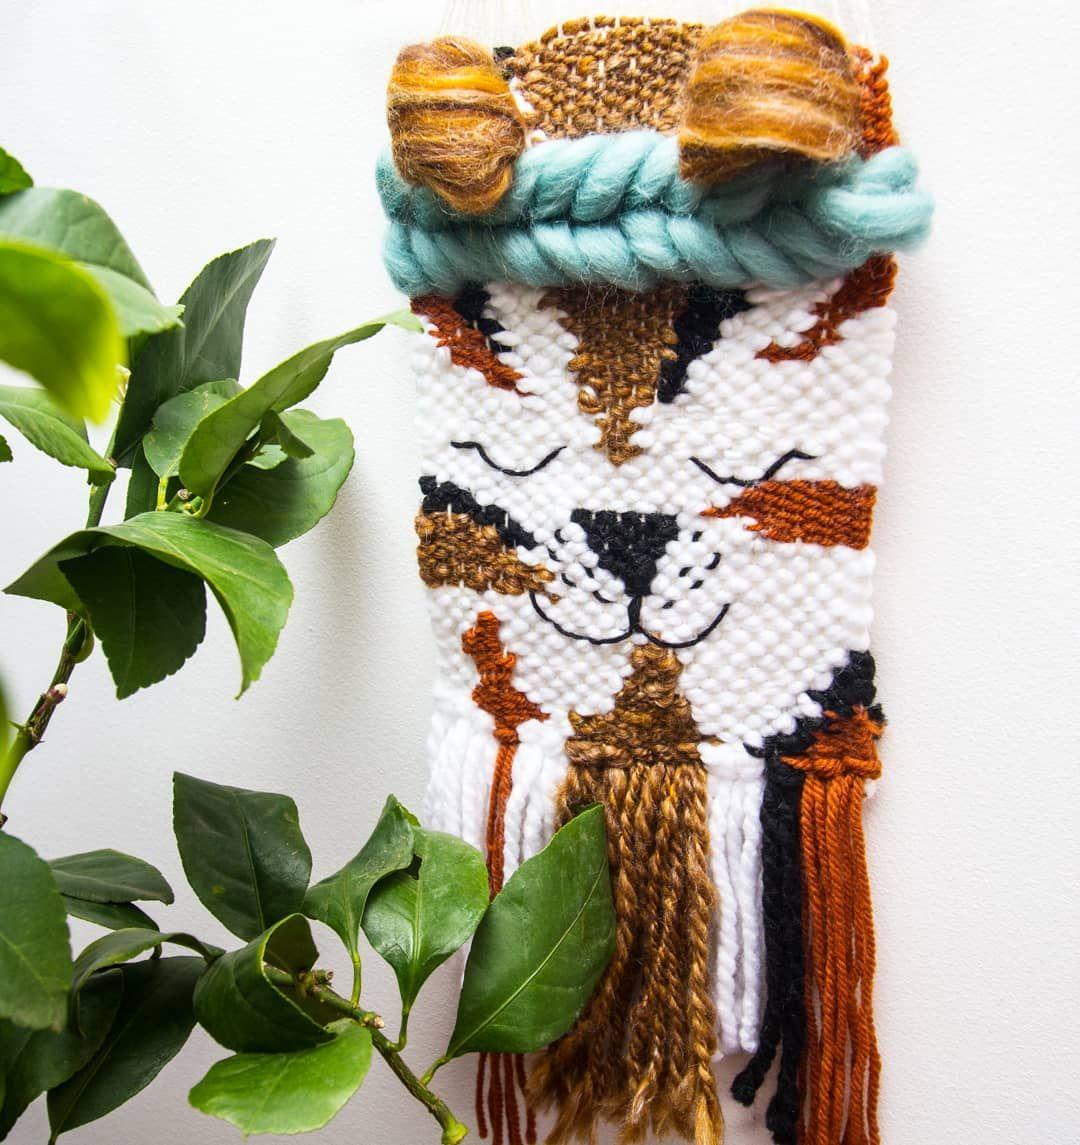 This one is still one of my favourite unisex nursery wall hanging and by the way it is on SALE😉👌 #shopsale #etsysales #etsysalesevent #etsysale #etsyuk #etsyselkeruk #homedecor #homedecoration #homedecorations #wallhangings #wallhanging #nurserydecoration #nurseryinterior #nursery #nurseryartwork #unisexnursery #nurserywallhanging #textileart #tiger #tigerdecor #weaving #weavingforkids #woodlandnursery #neutralnursery #tissagemoderne #tissage #modernweaving #interiordecoration